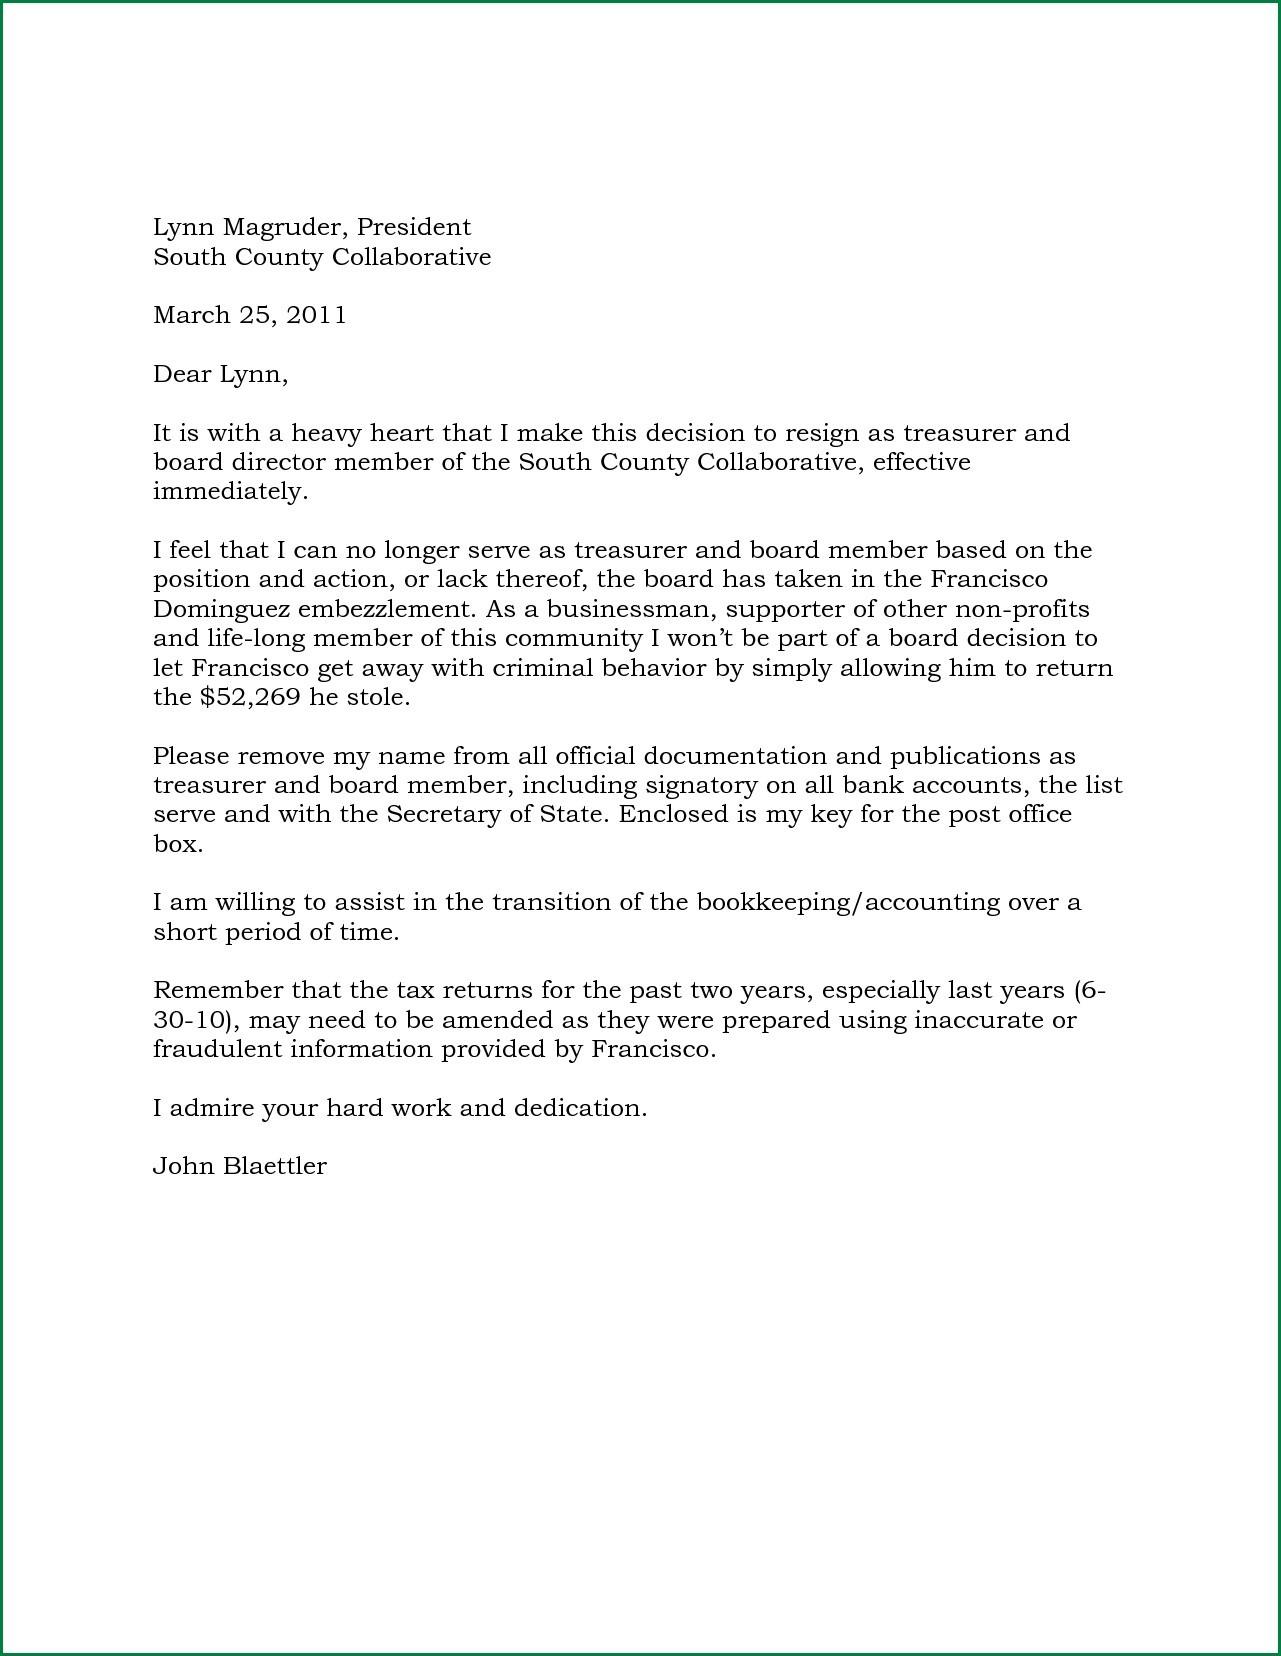 Formal Resignation Letter Template - formal Resignation Letter Template E Month Notice Copy Cards